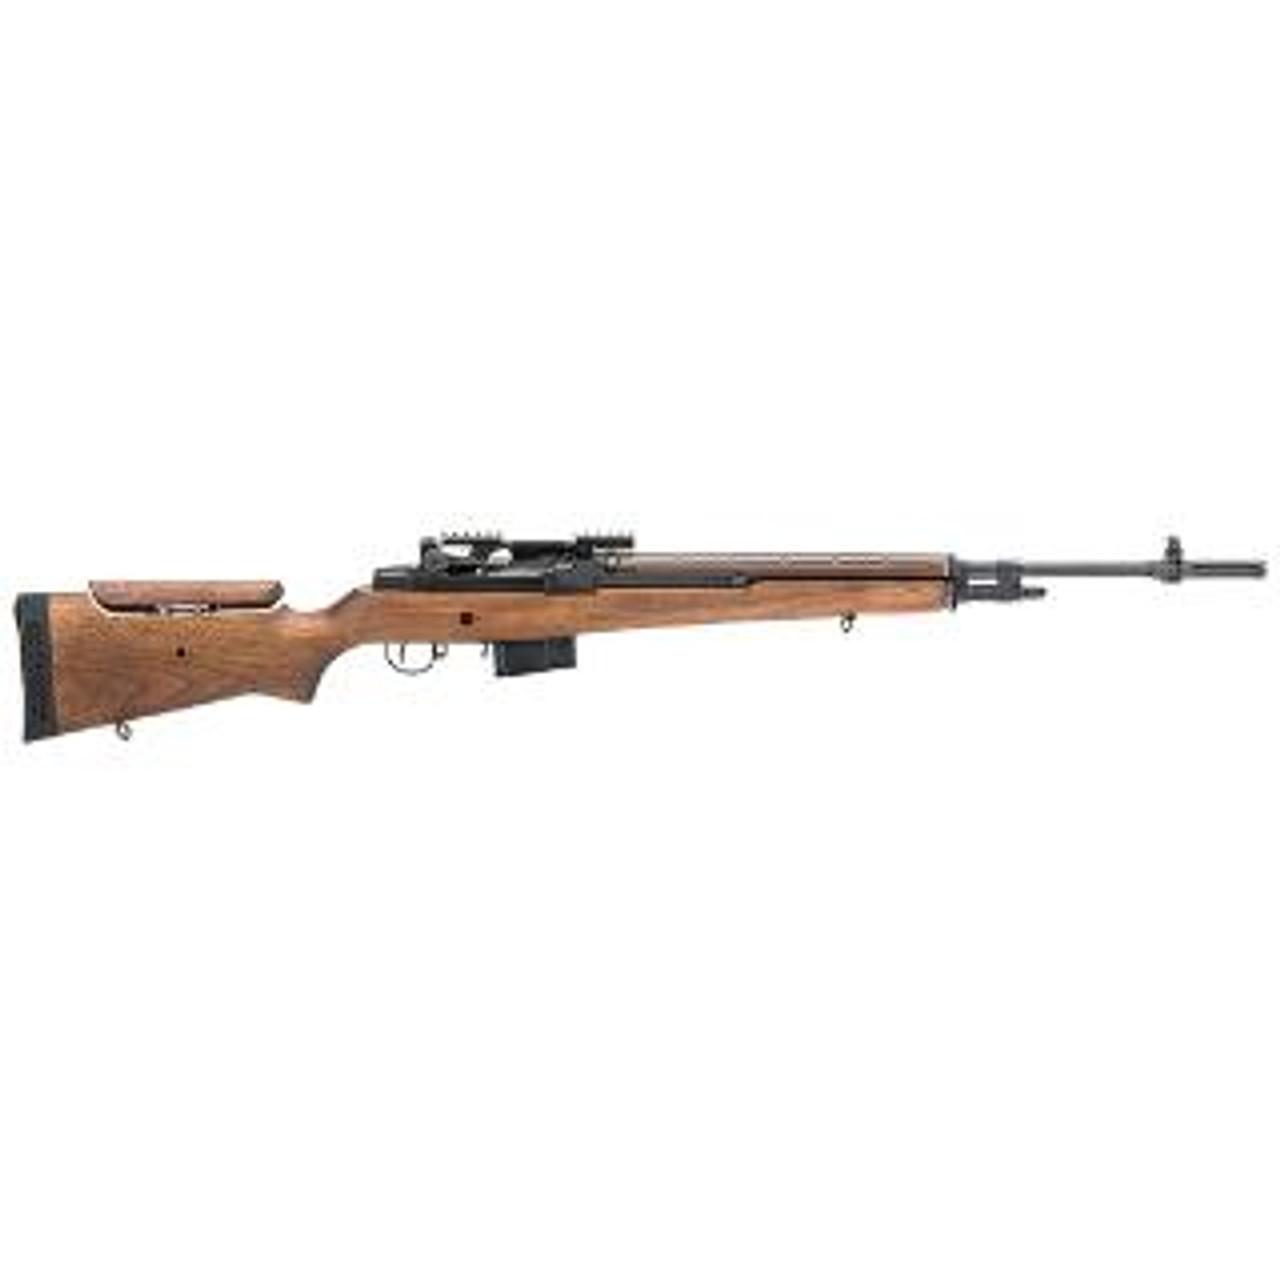 Springfield M1A M21 Long Range Match CALIFORNIA LEGAL - .308/7.62x51 - Walnut